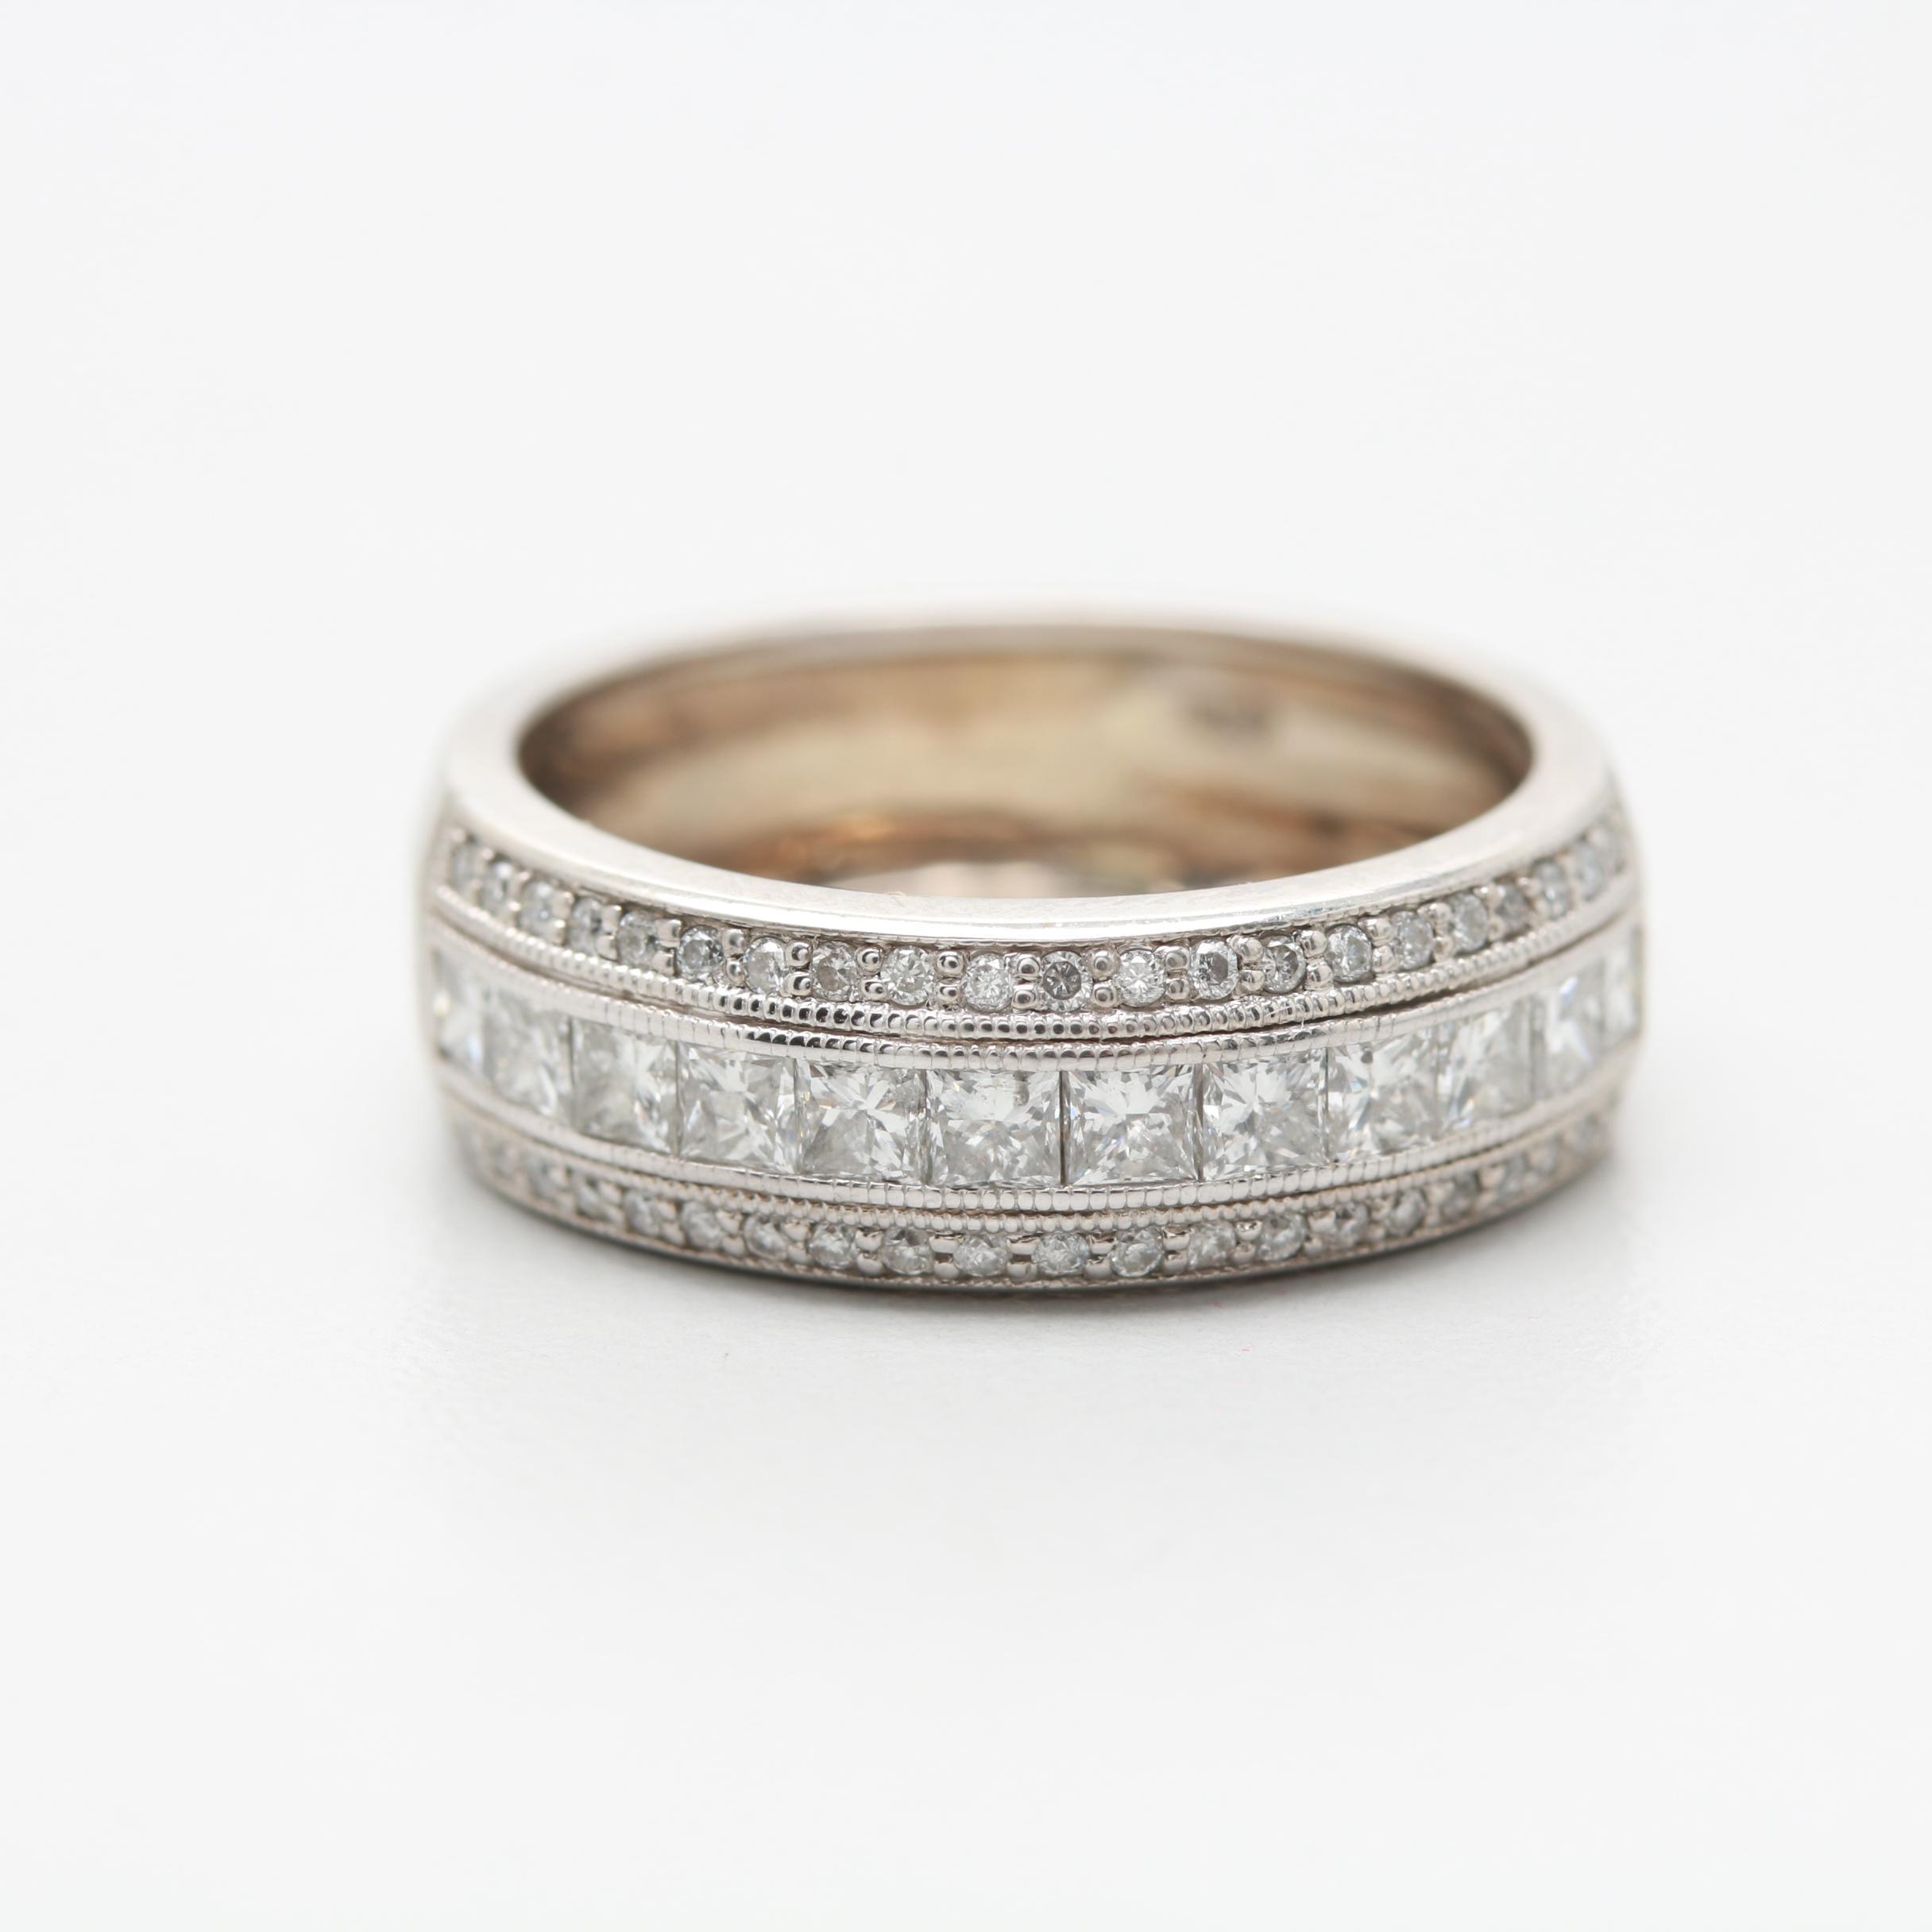 14K White Gold 0.99 CTW Diamond Ring